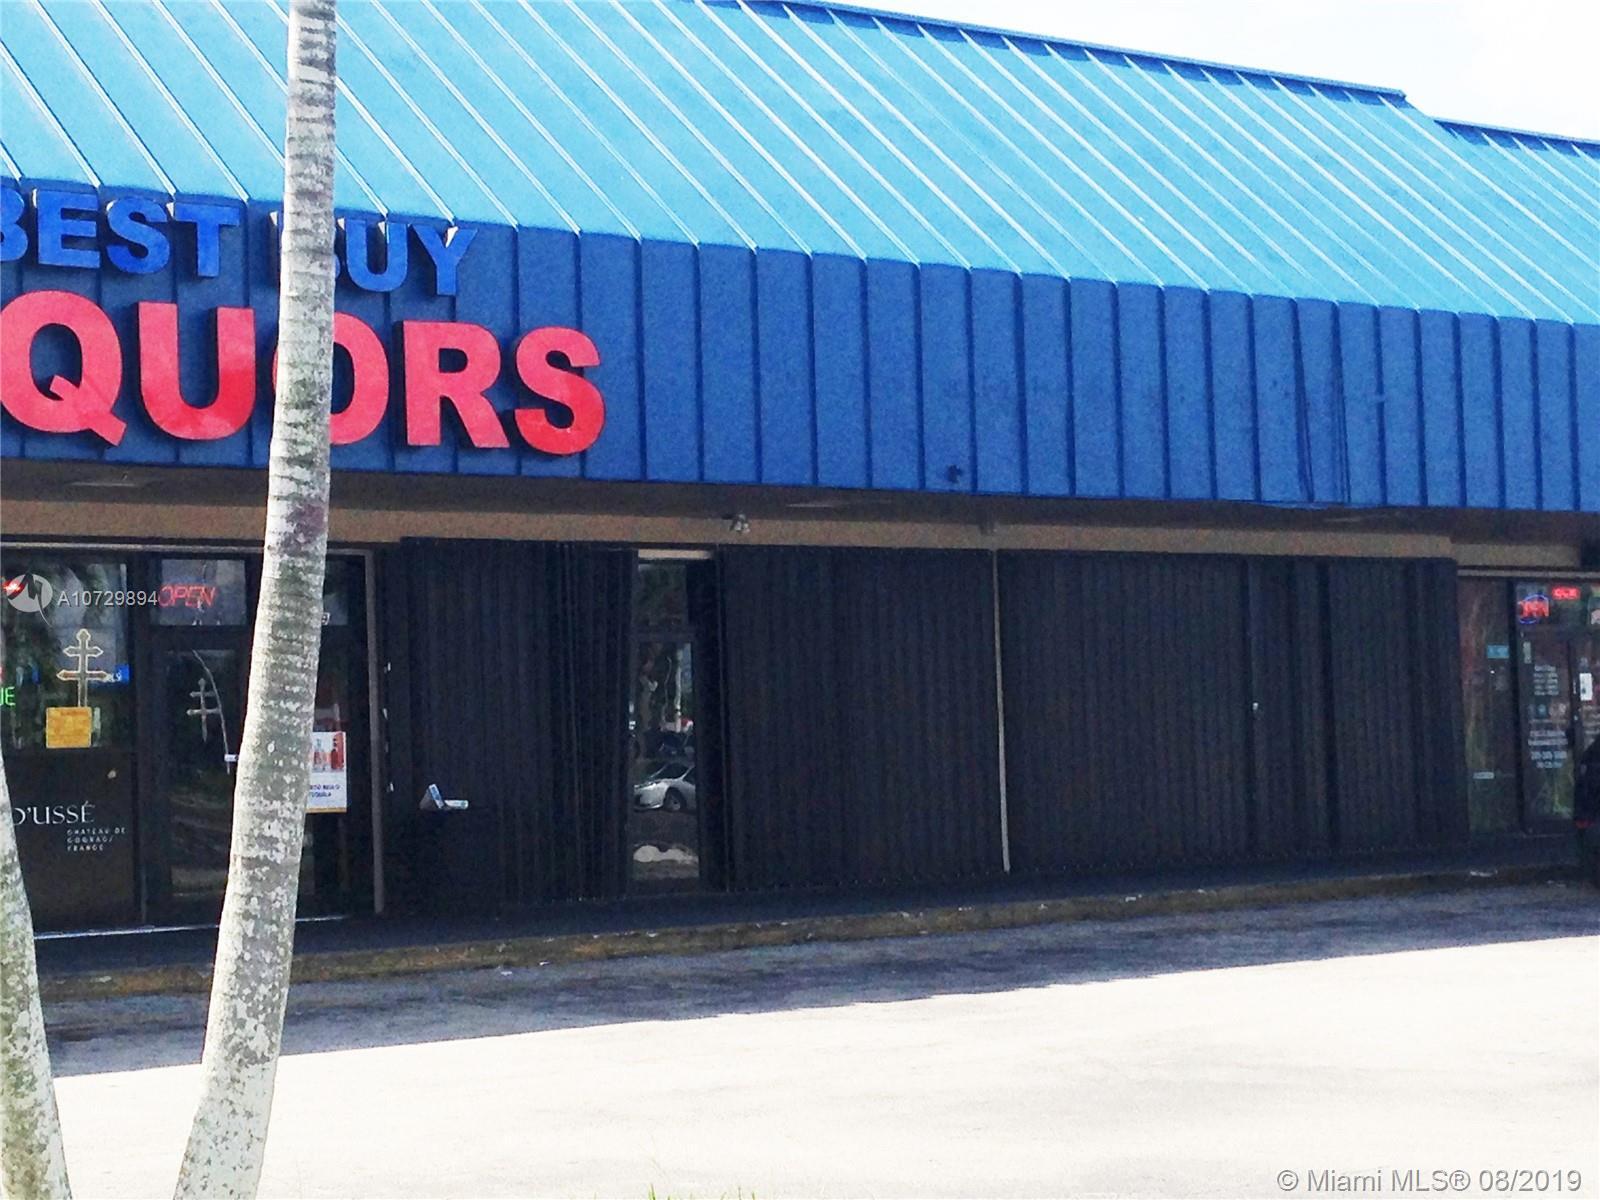 27319 S Dixie Hwy, Naranja, FL 33032 - Naranja, FL real estate listing